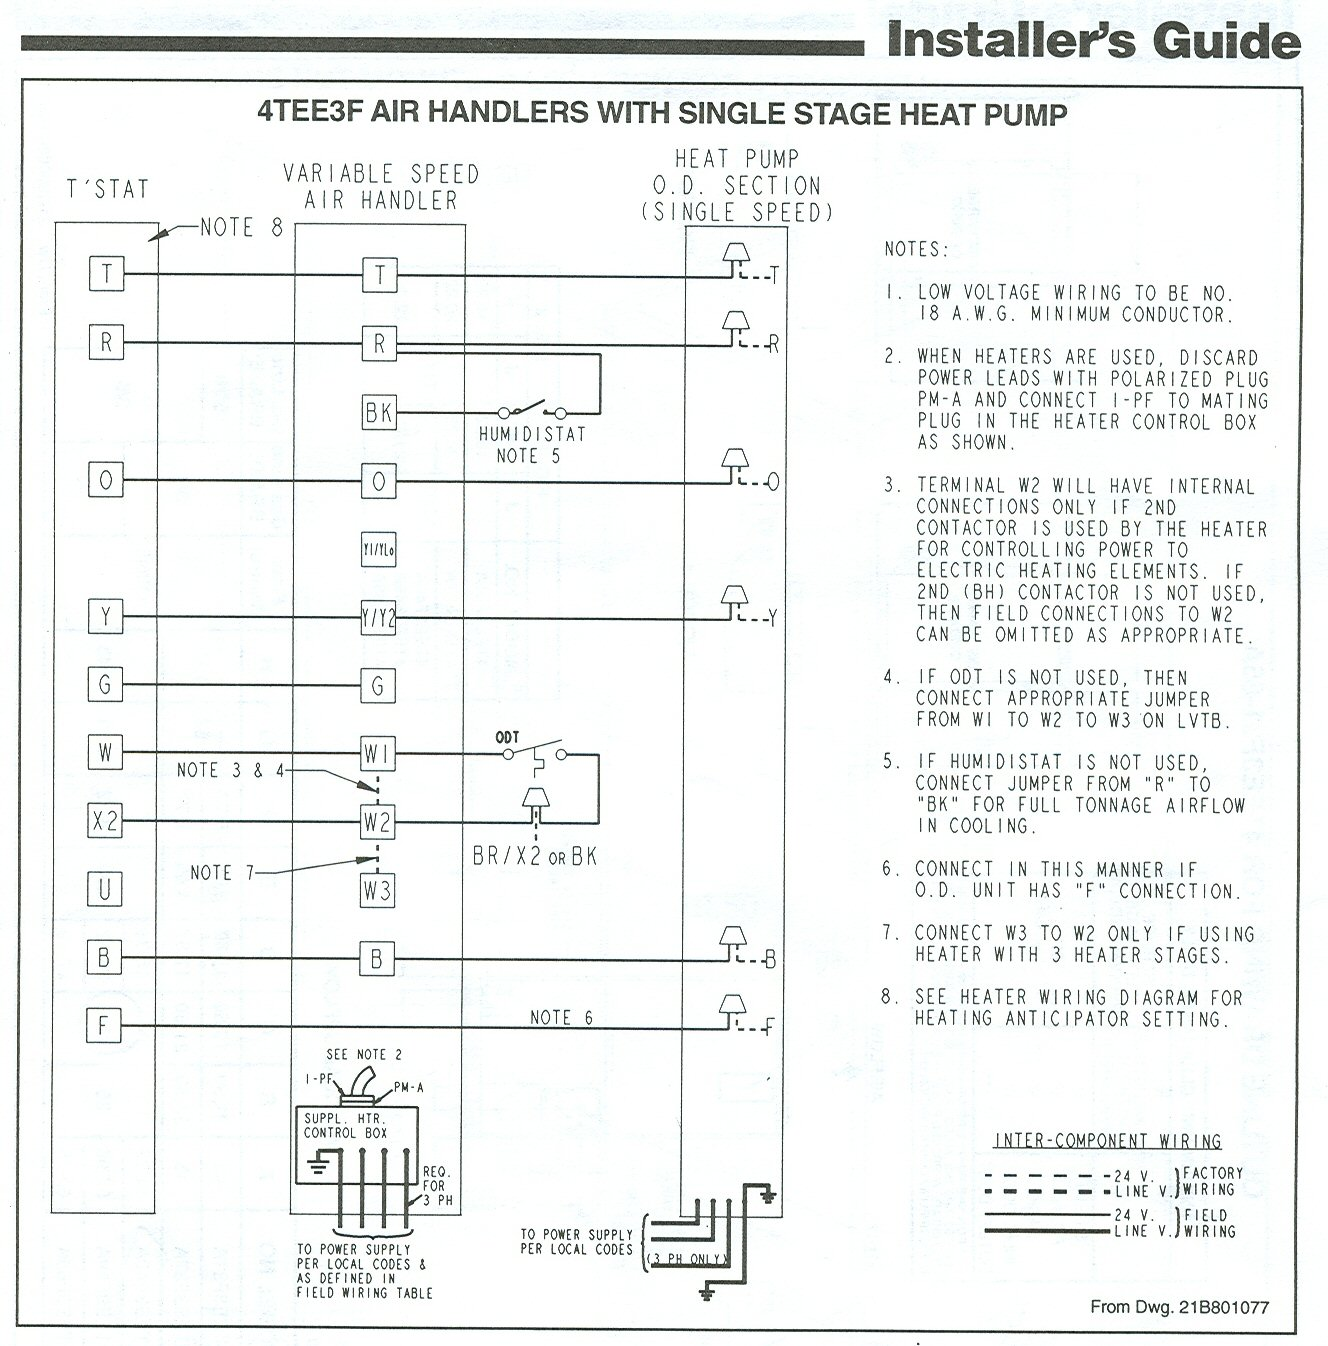 Hvac Talk Heating Air Refrigeration Discussion Defrost Timer Wiring Http Munsonandbryancom Ah